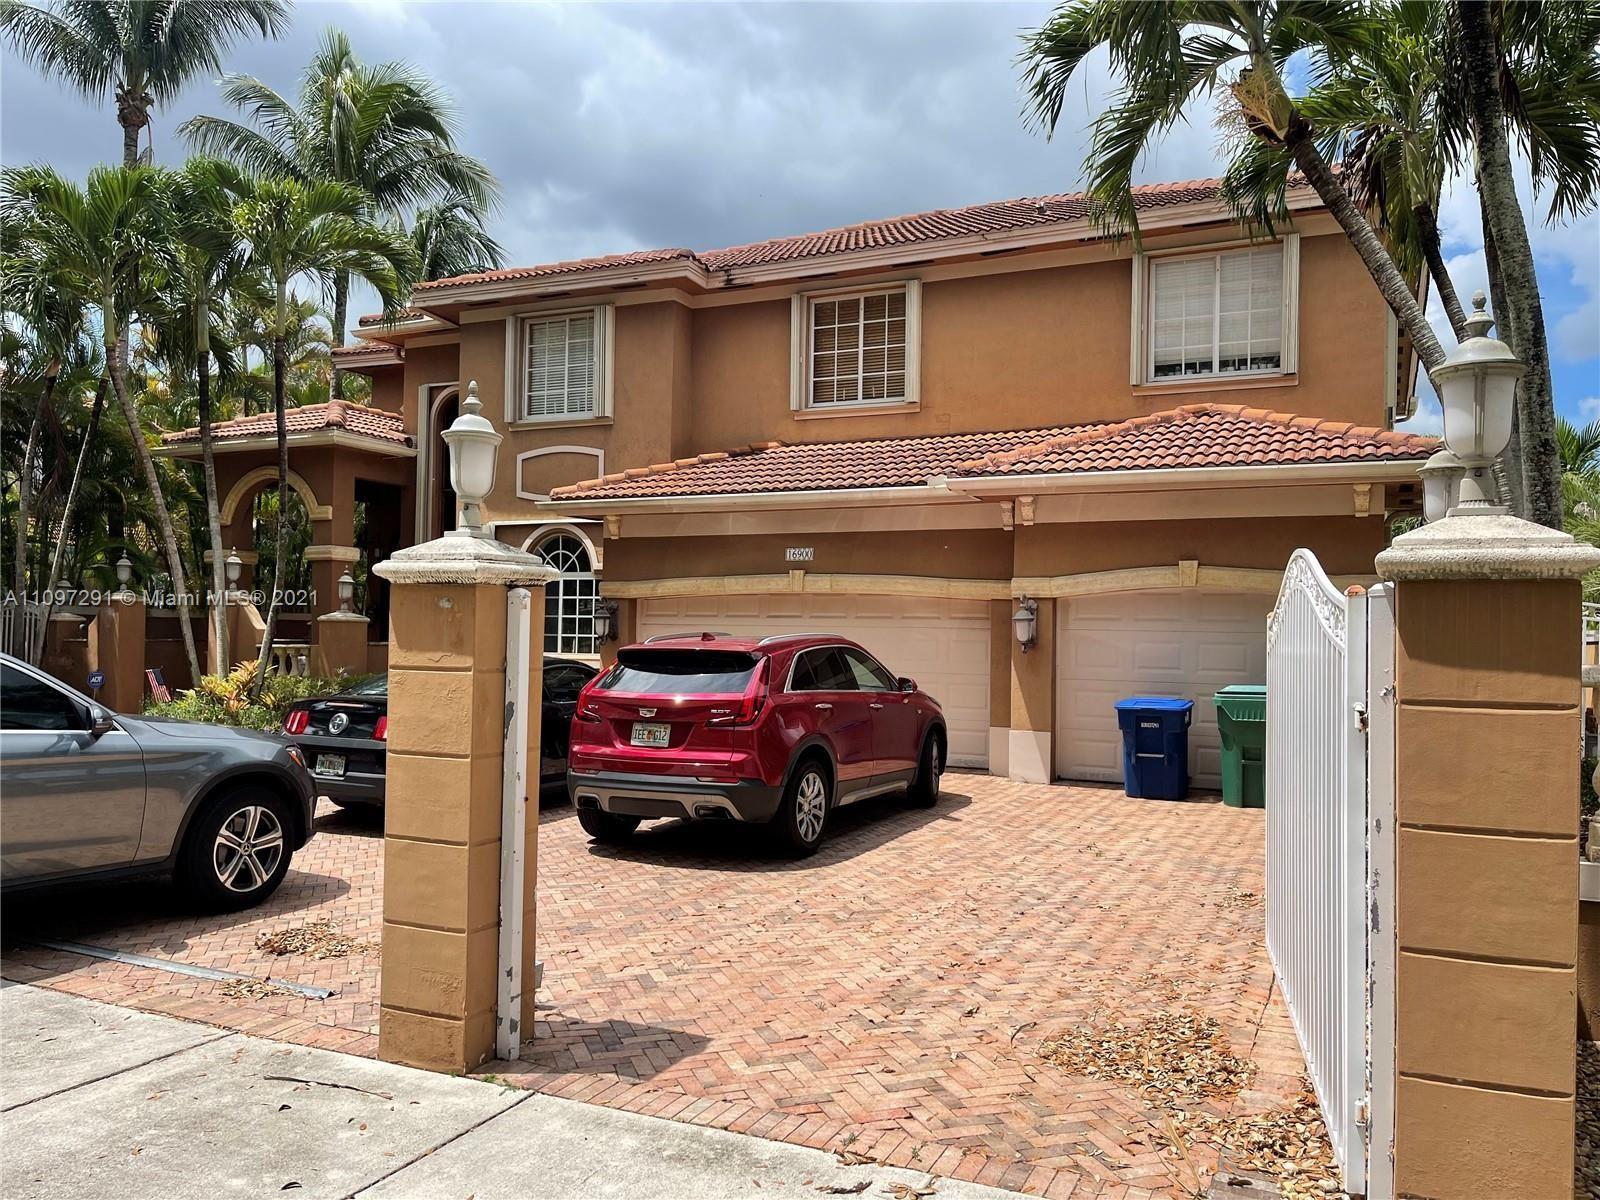 16900 NW 78th Ave, Miami Lakes, FL 33016 - #: A11097291